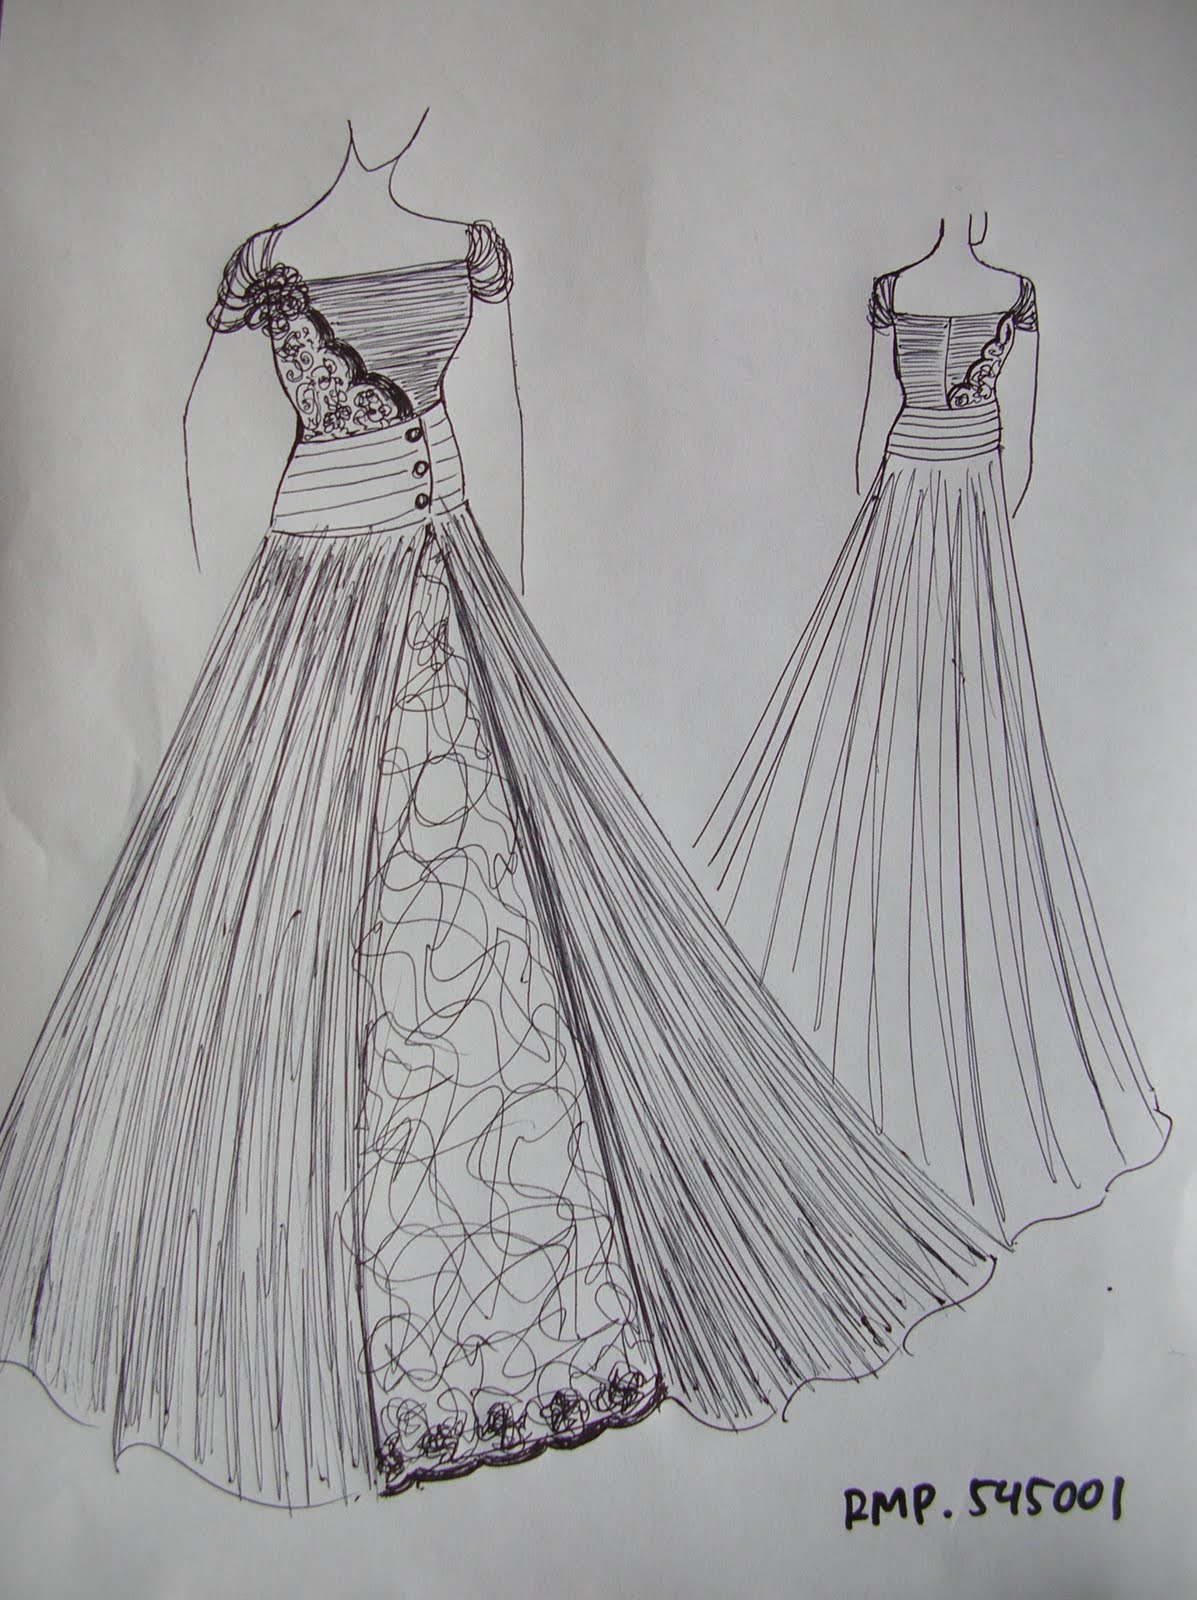 Gambar Desain Baju Pesta Modern  gambar desain baju pesta